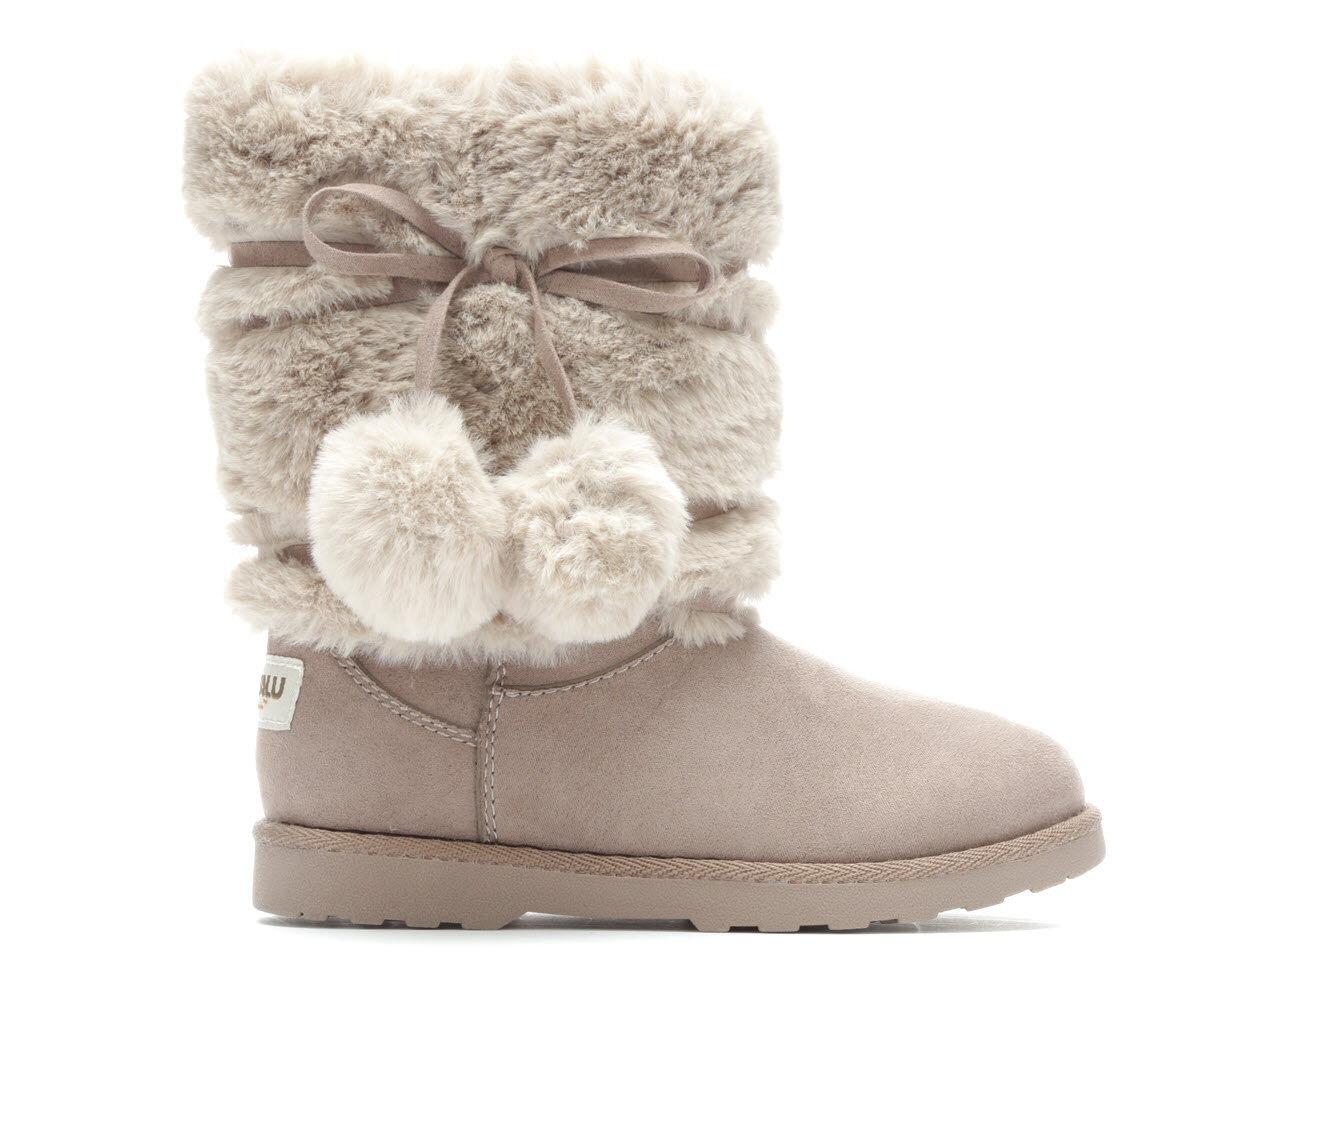 Kid Cozy Land Boots | Shoe Carnival